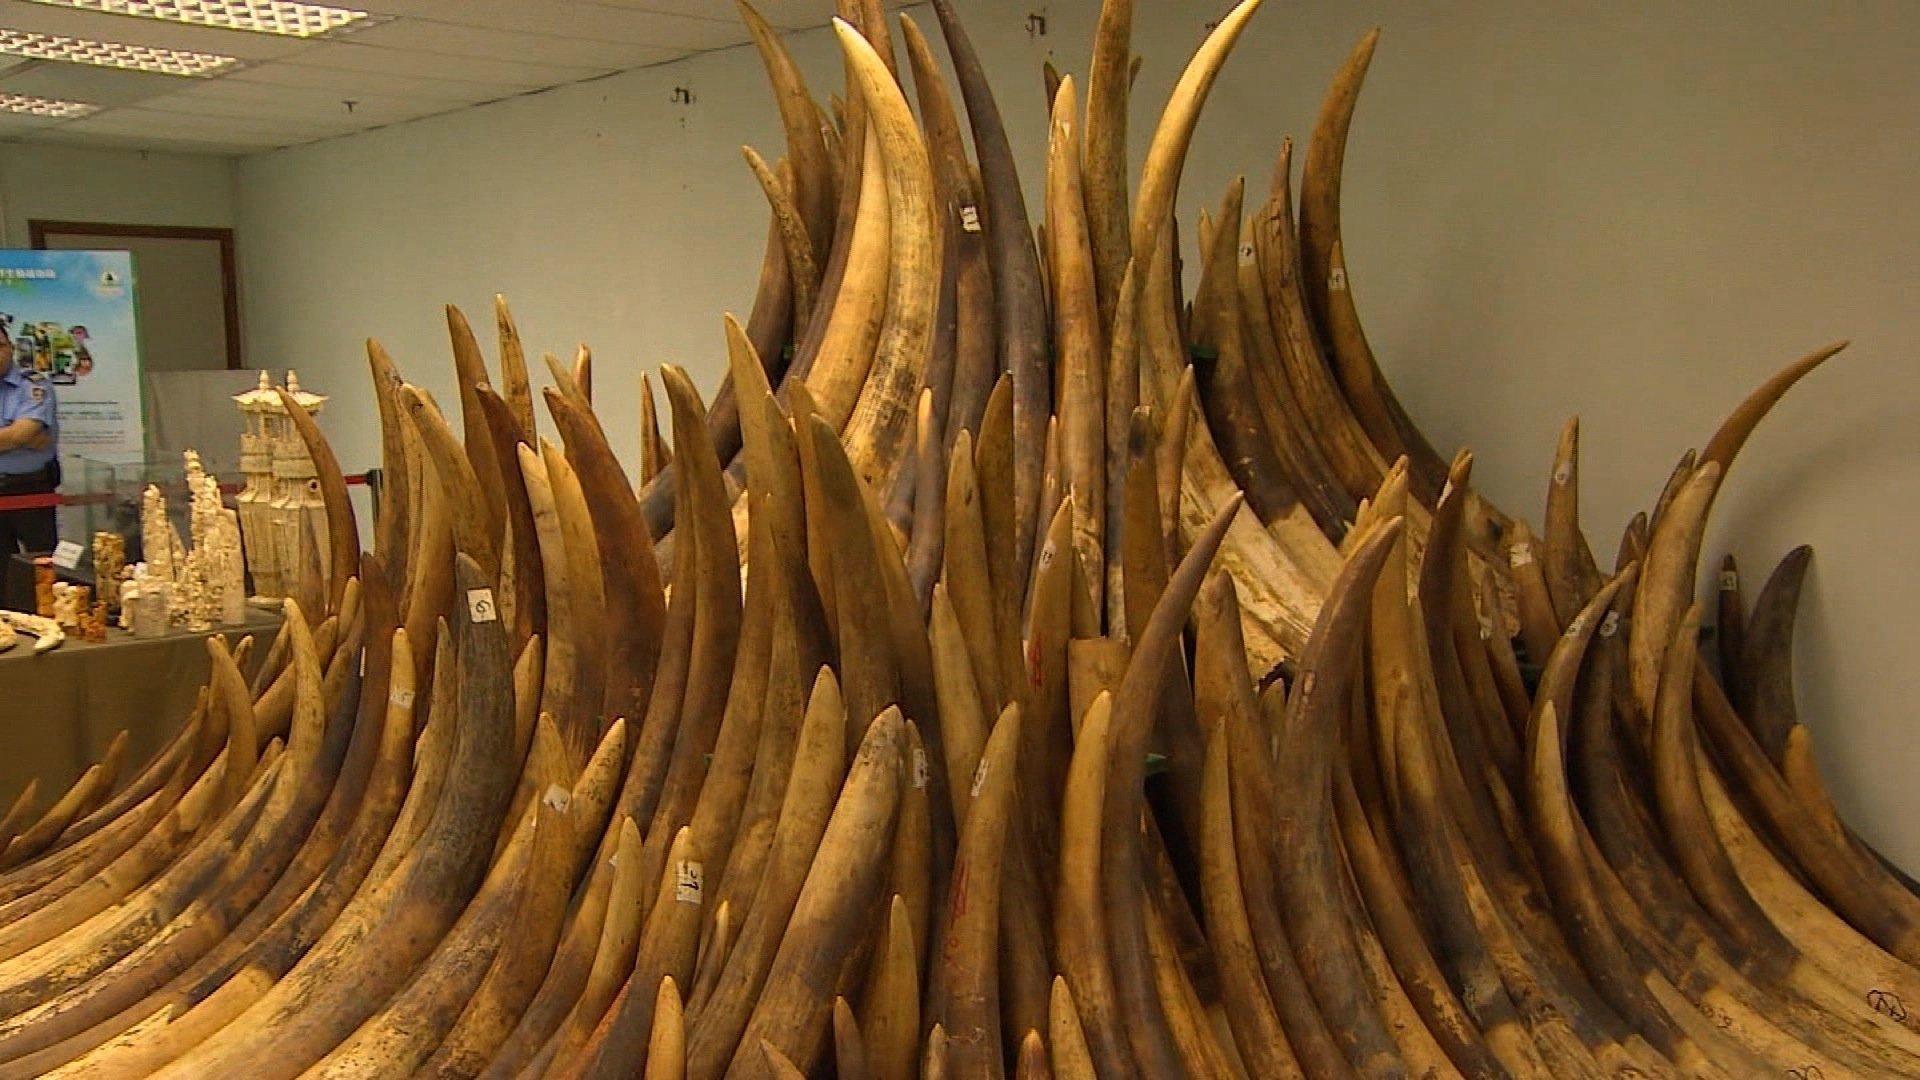 ivory-ban-hong-kong-cnn.jpg